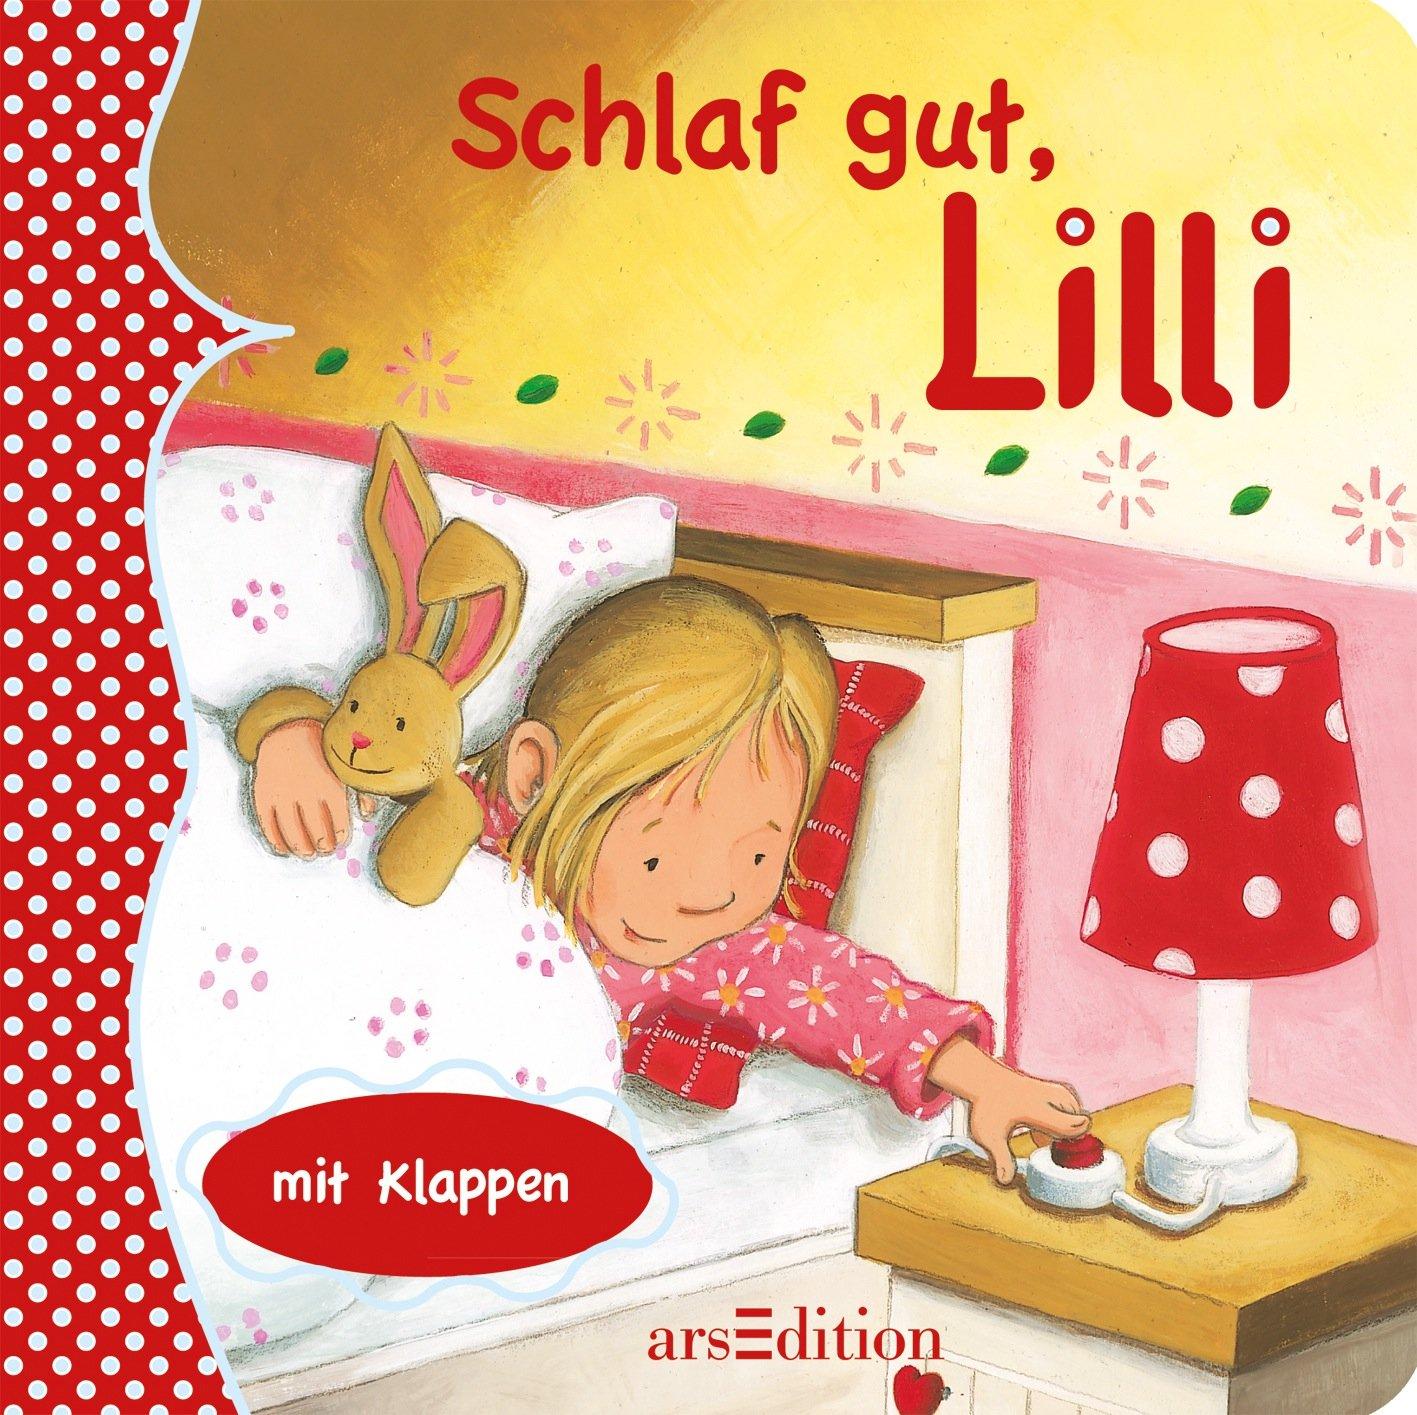 Schlaf gut,Lilli